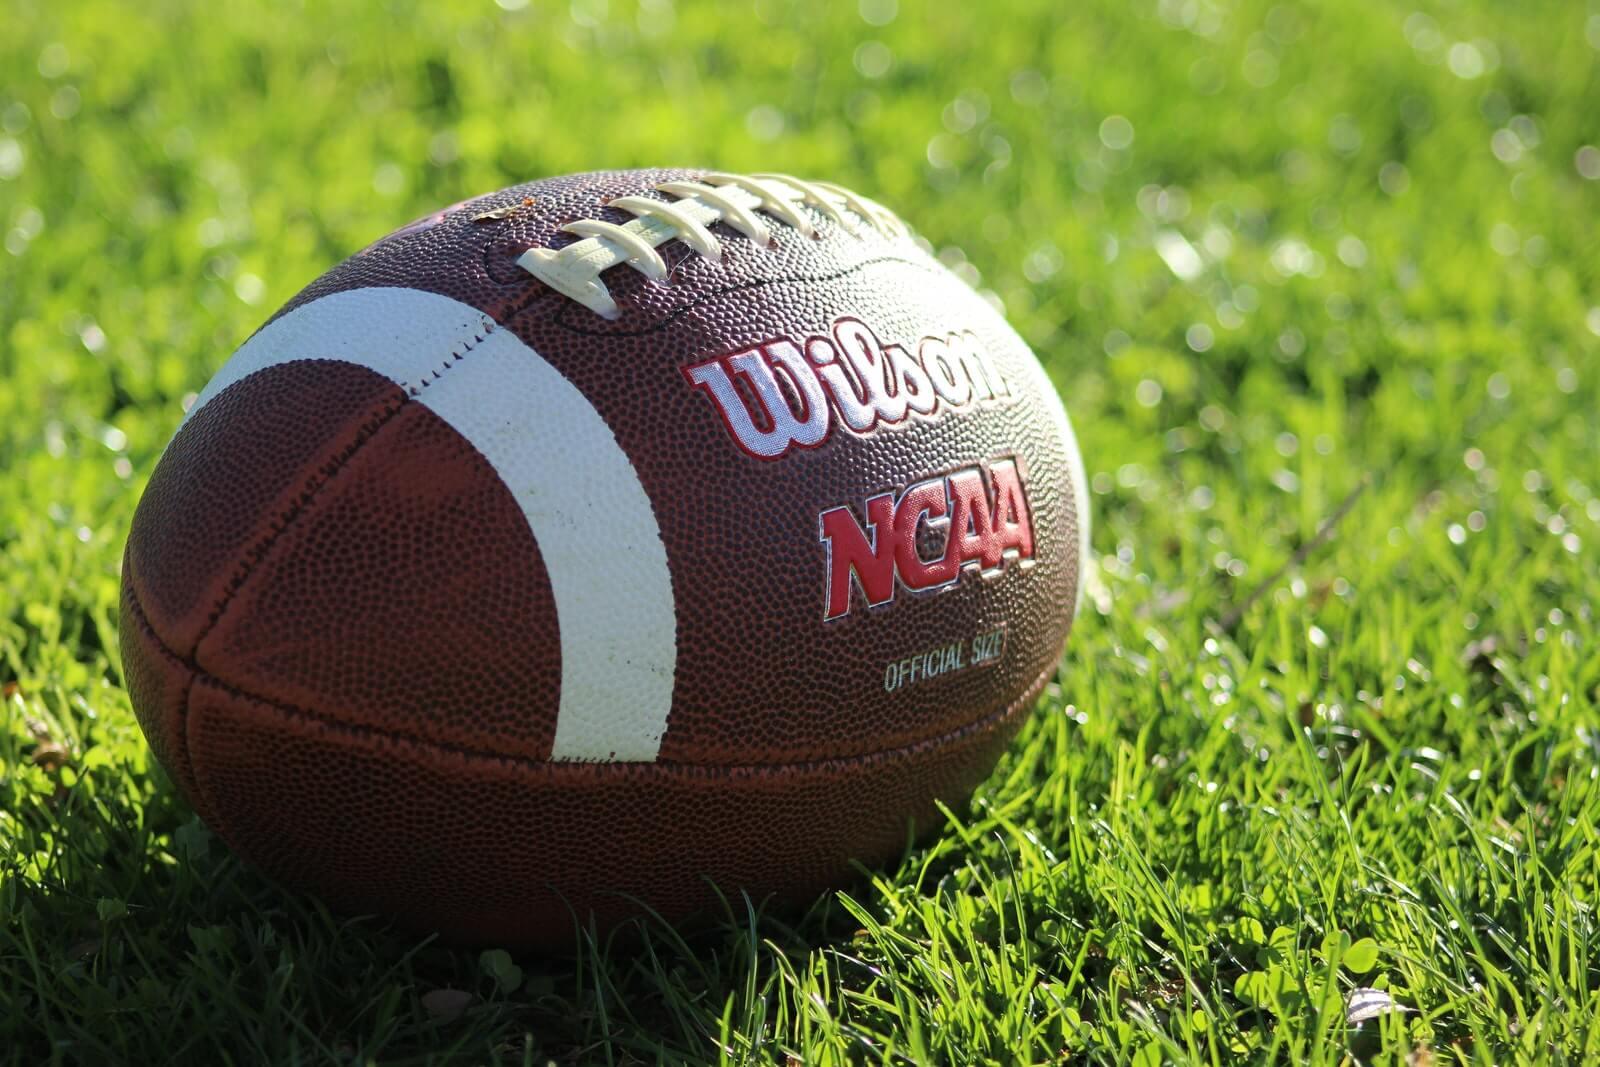 football with ncaa logo